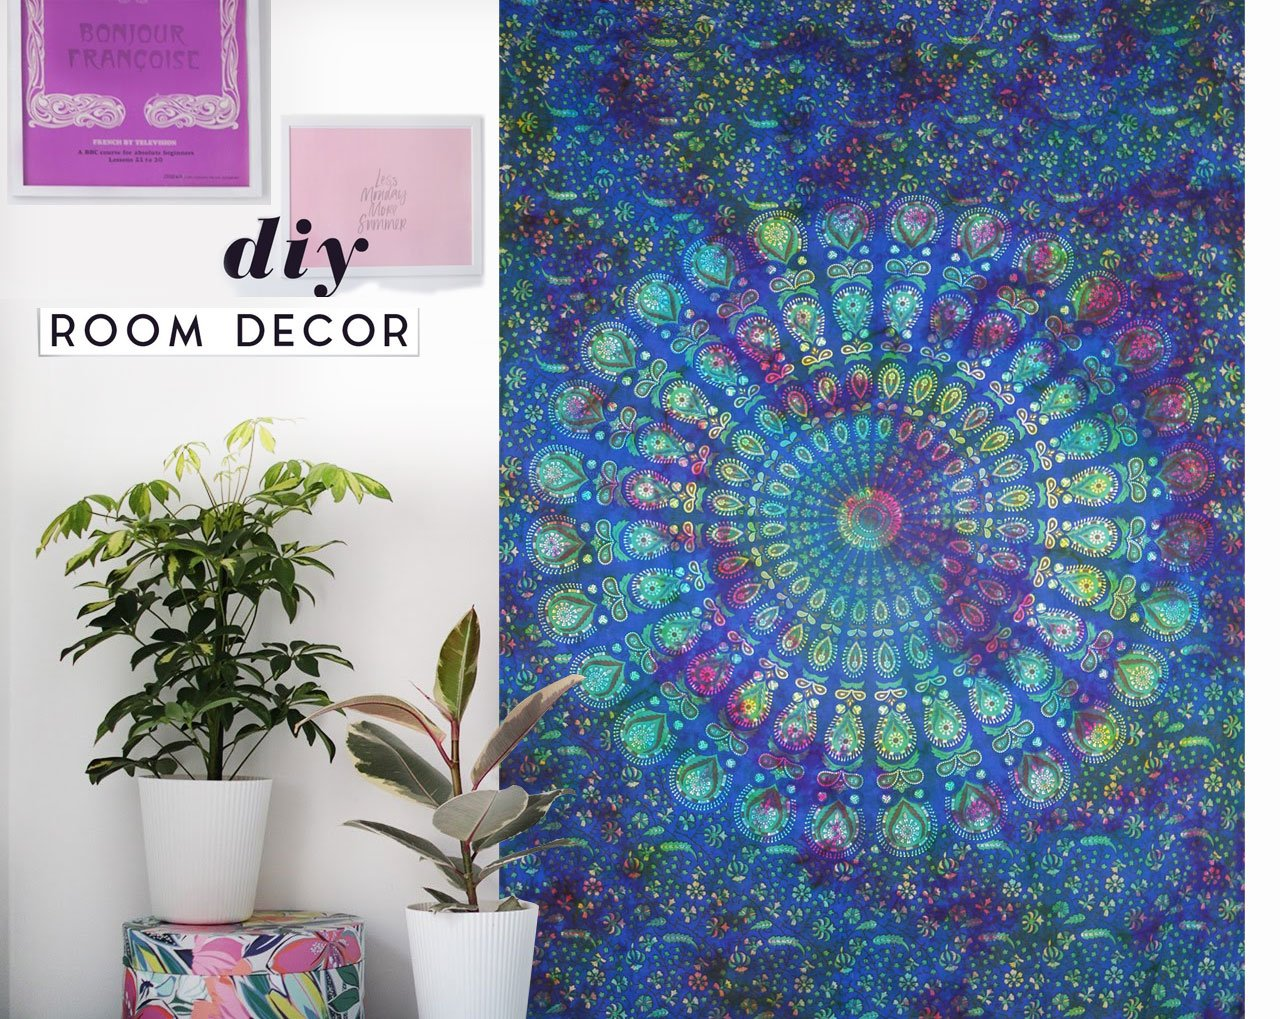 Future Handmade Twin Size Tie Dye Mandala Tapestry Pure Cotton Bed Sheet Bohemian Mandala Modern Bedroom India Handmade Room Decoration Wall Hanging Handmade Bedspread (Design 8)